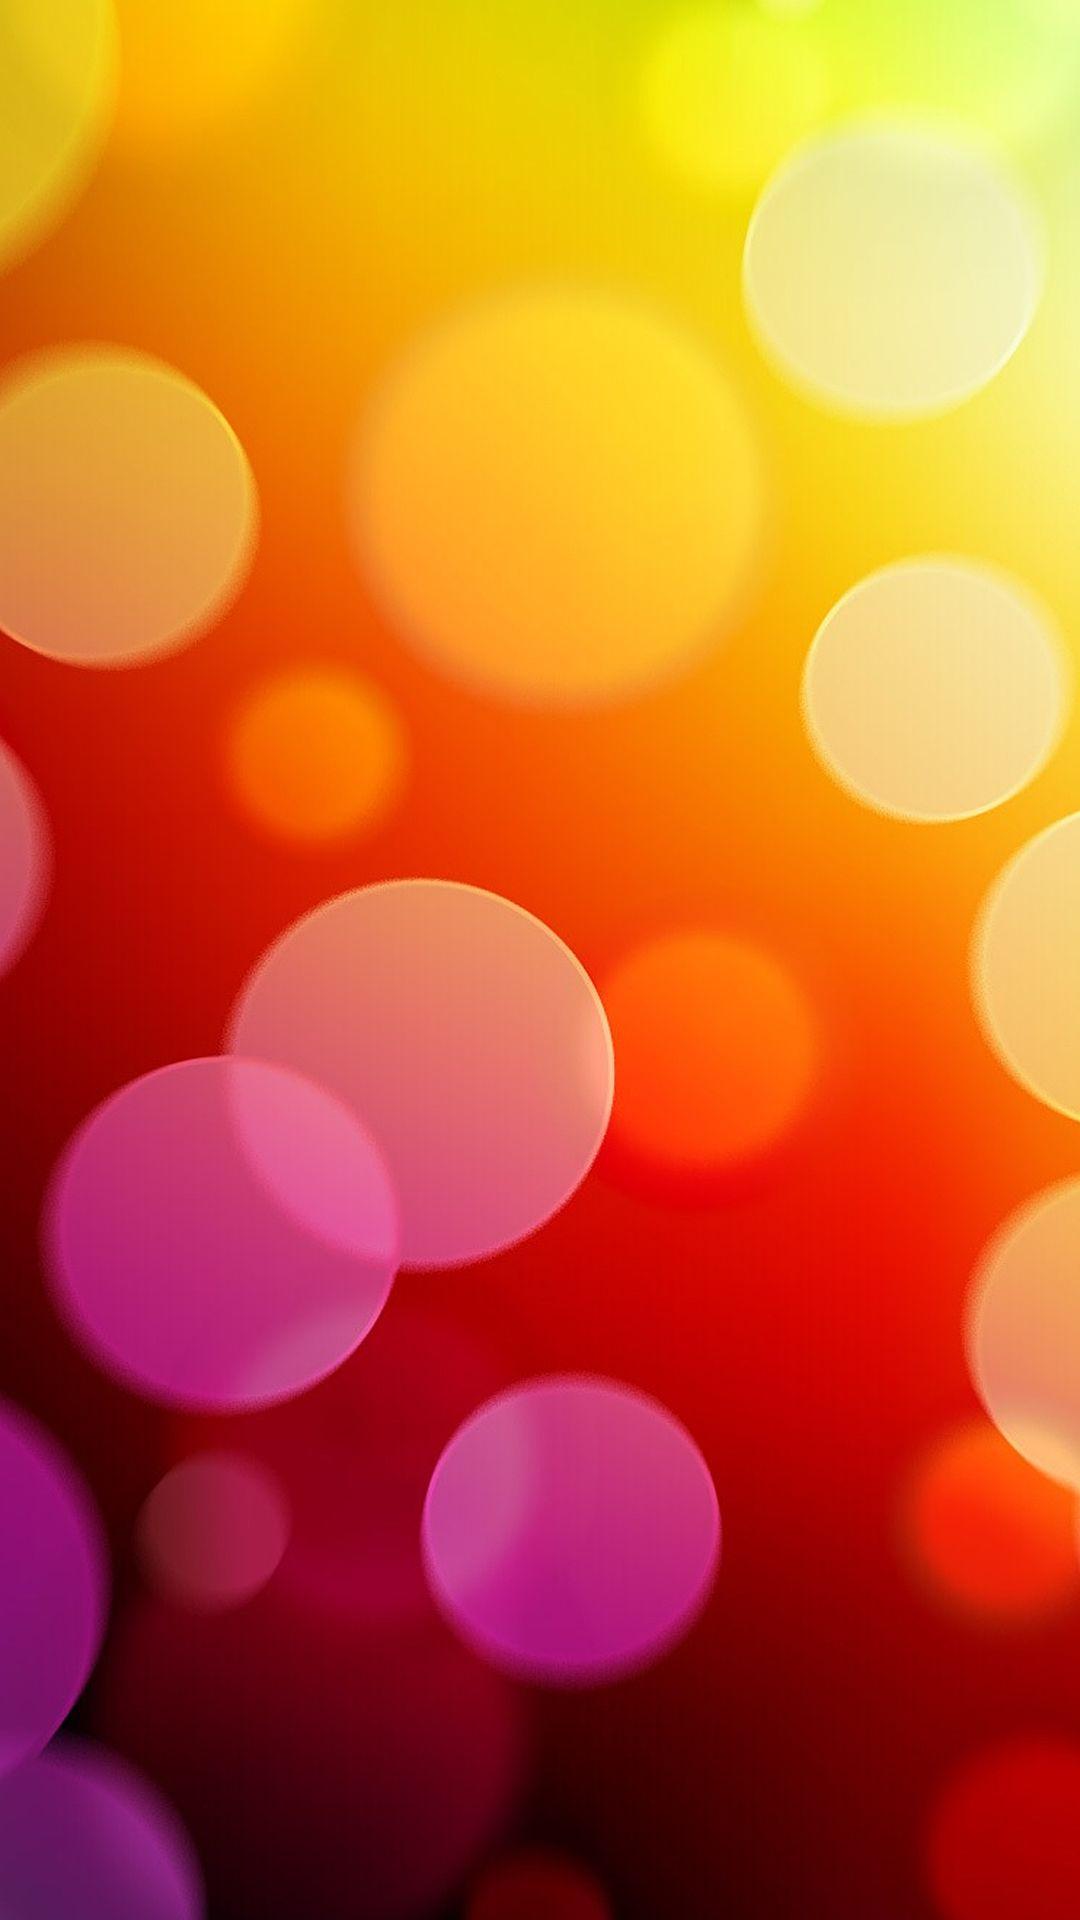 Orange Bubbles Iphone 6 Plus Wallpaper Iphone Wallpaper Orange Iphone 5s Wallpaper Wallpaper Iphone Cute